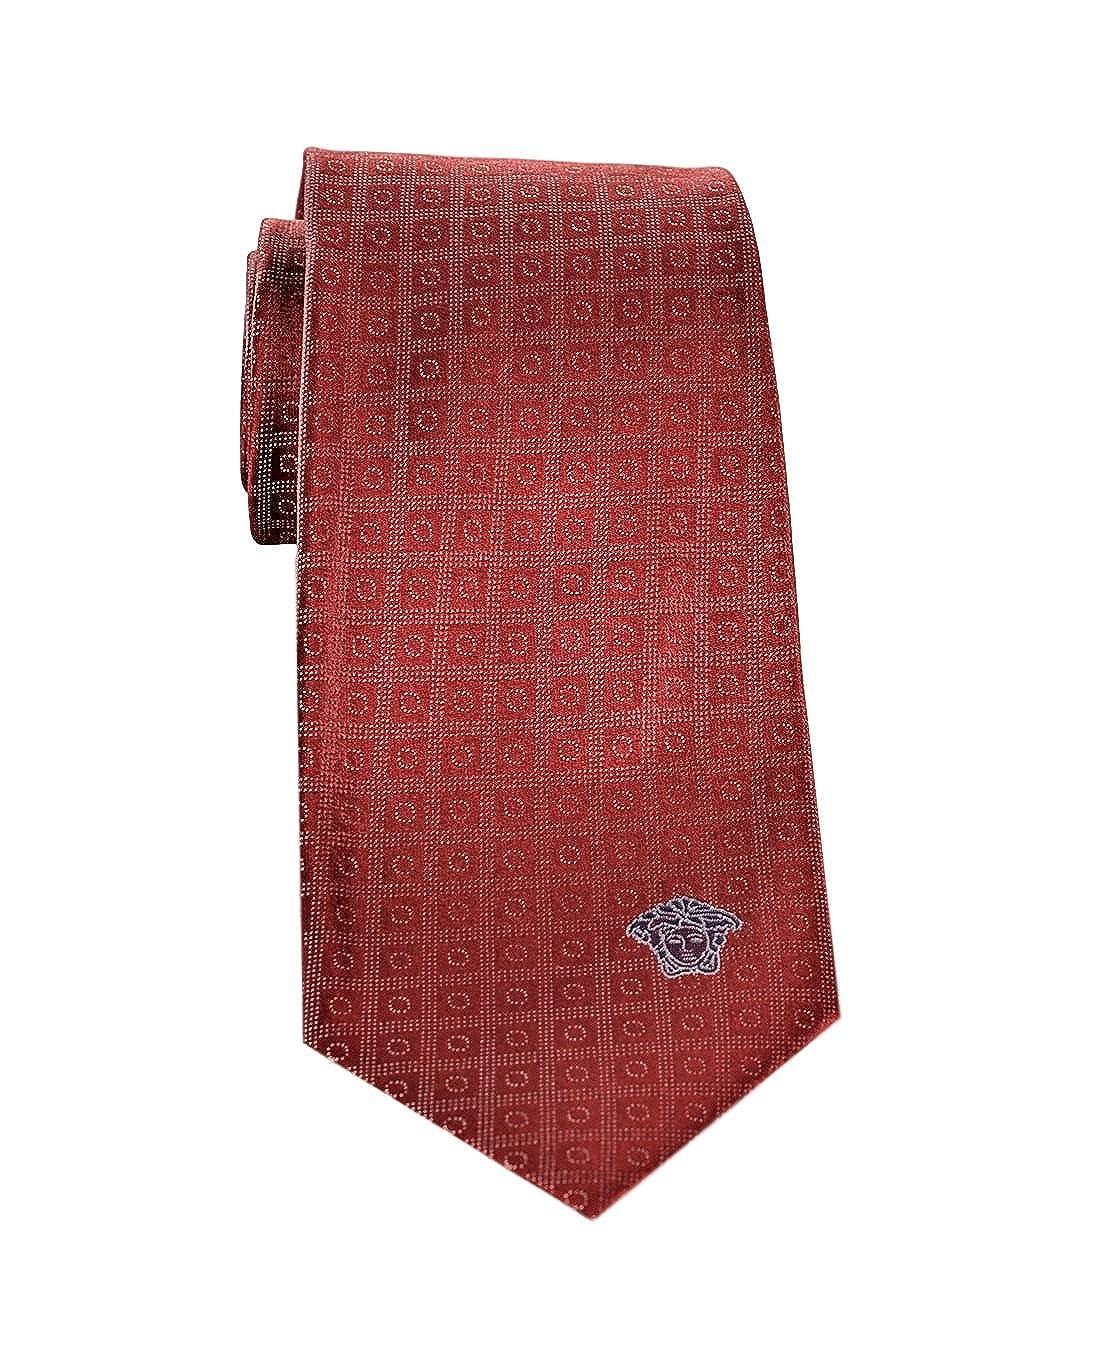 Versace Mens Geometrical Square Patterned Silk Necktie